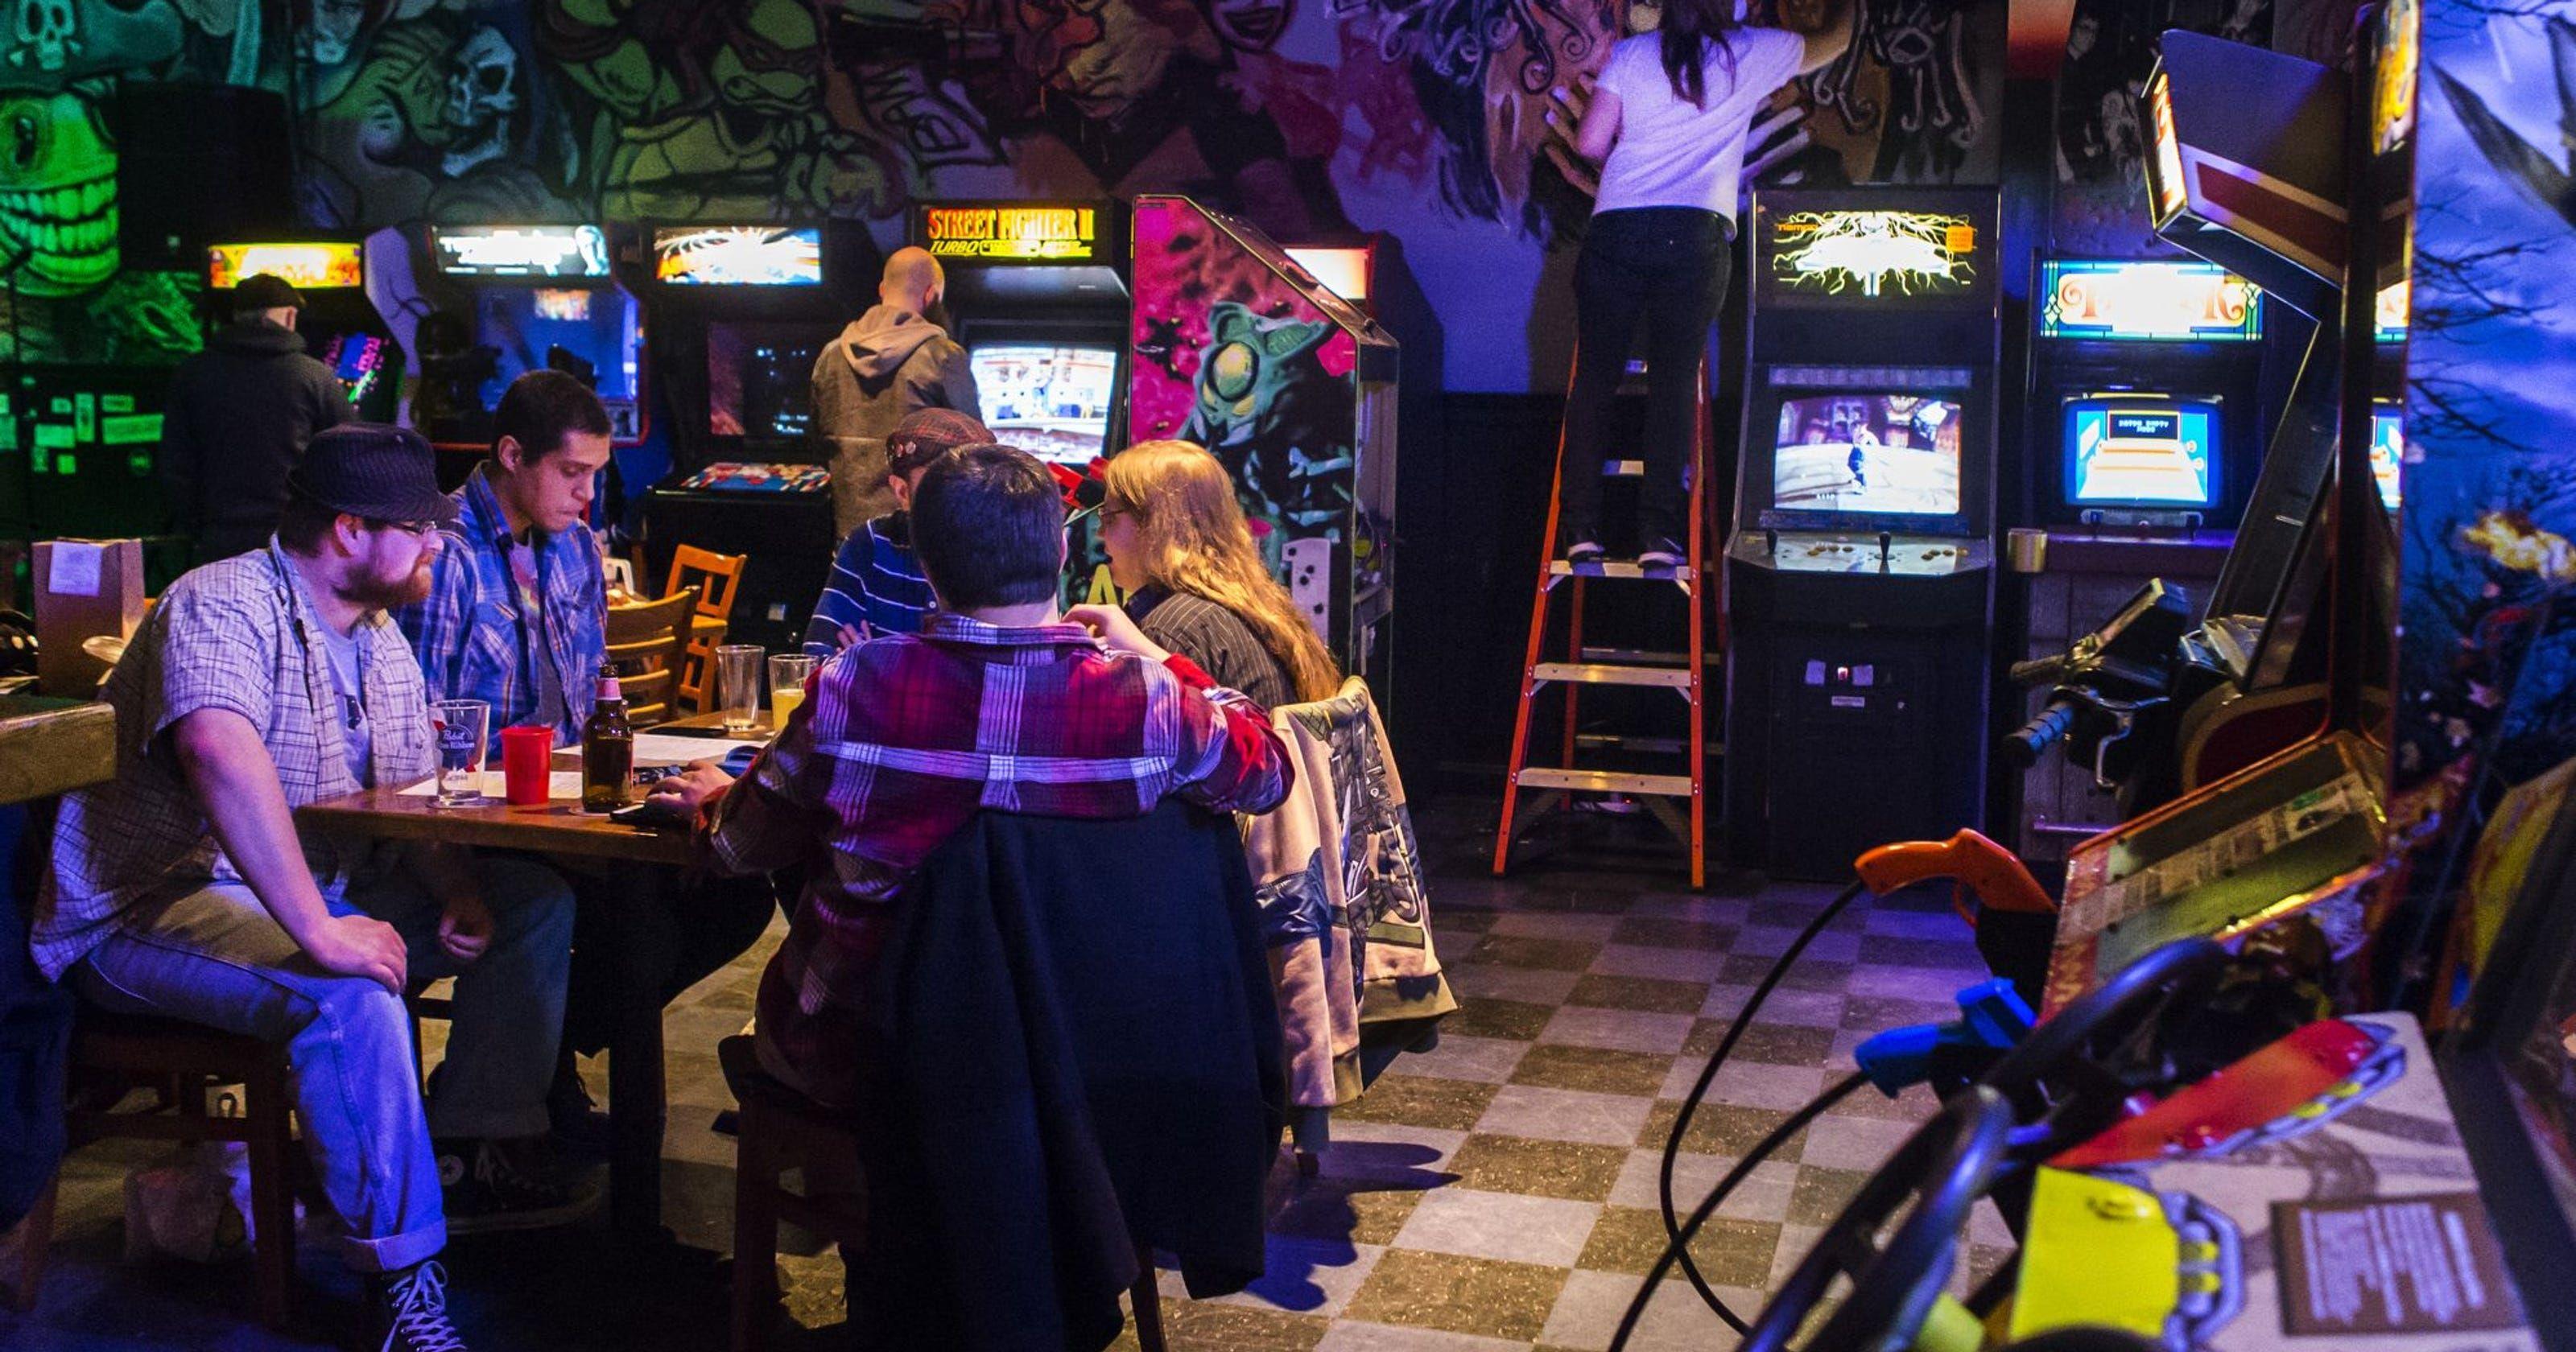 www.yourway.fun arcade spot gamesfree